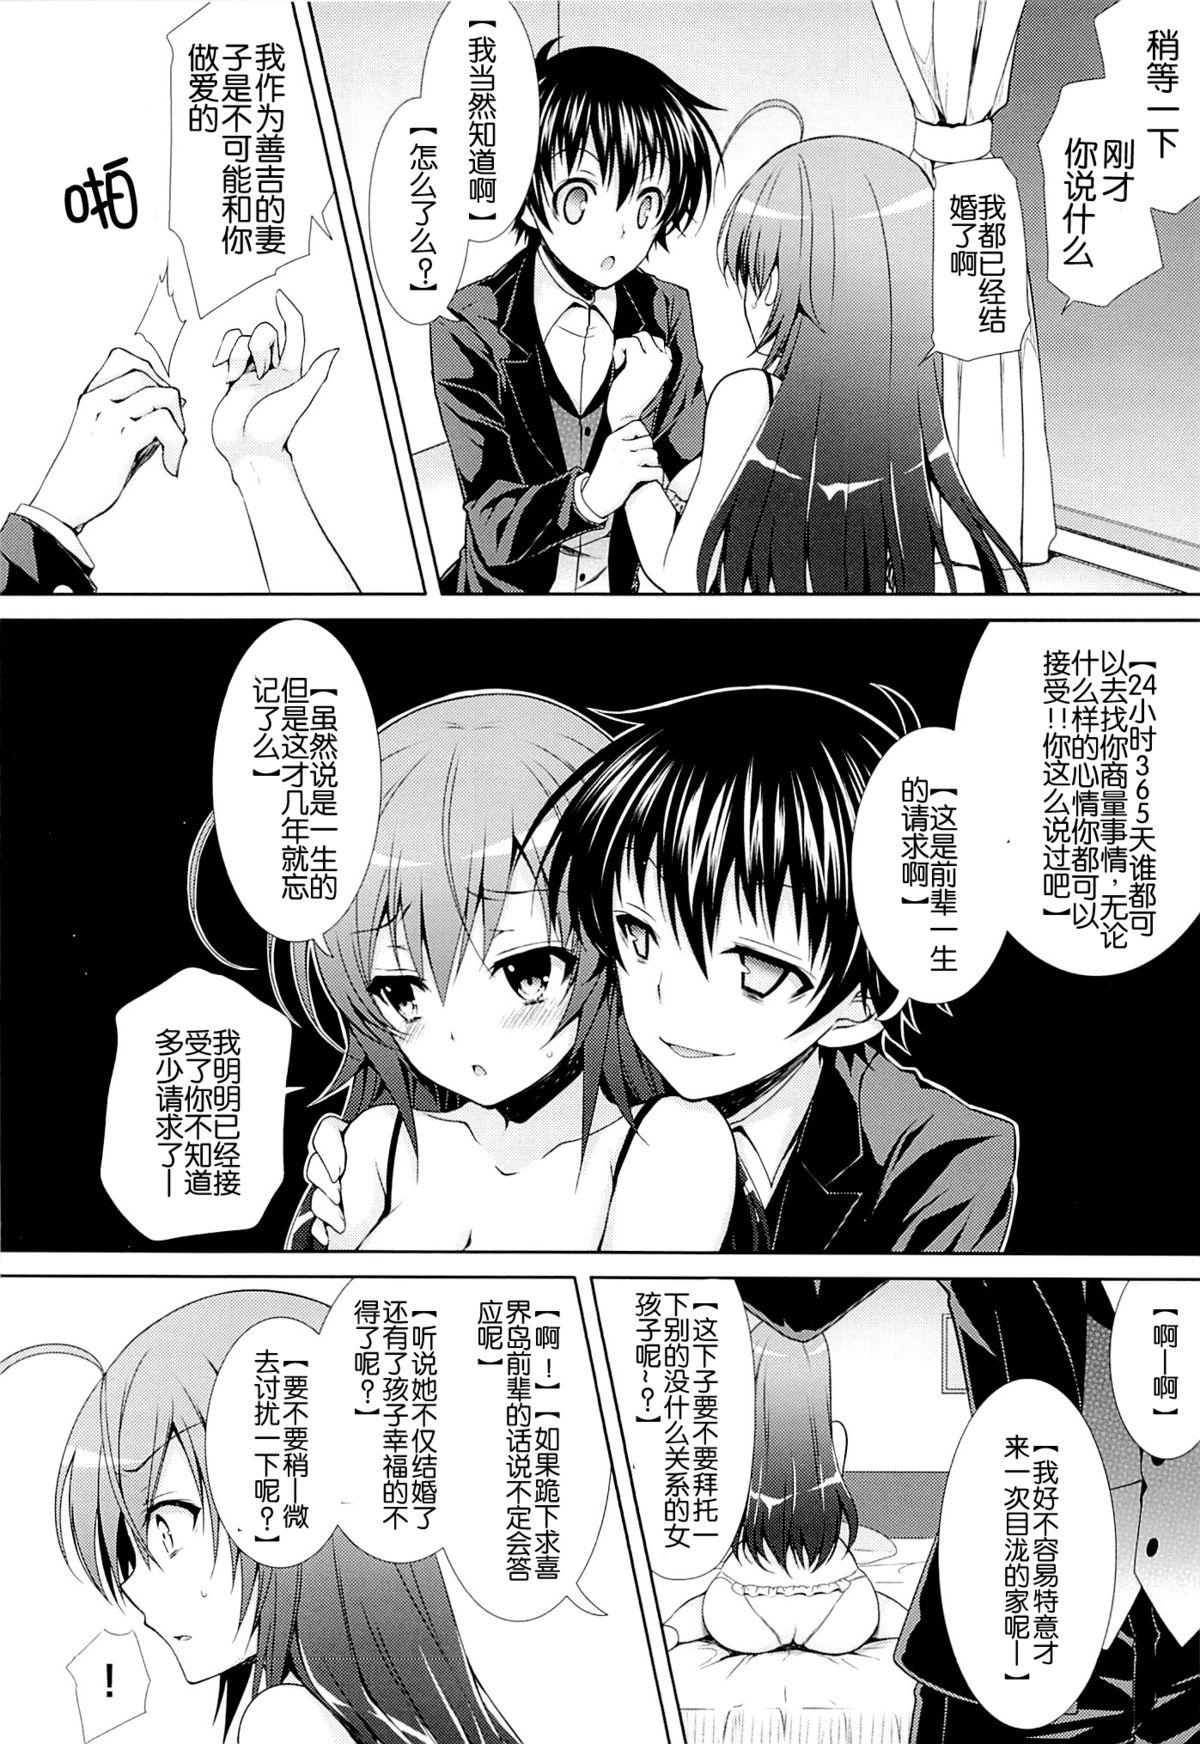 (C87) [Sugar*Berry*Syrup (Kuroe)] Hitozuma Medaka-chan (26) ga Kumagawa-kun ni NTR-reru Hon (Medaka Box) [Chinese] [脸肿汉化组] 7